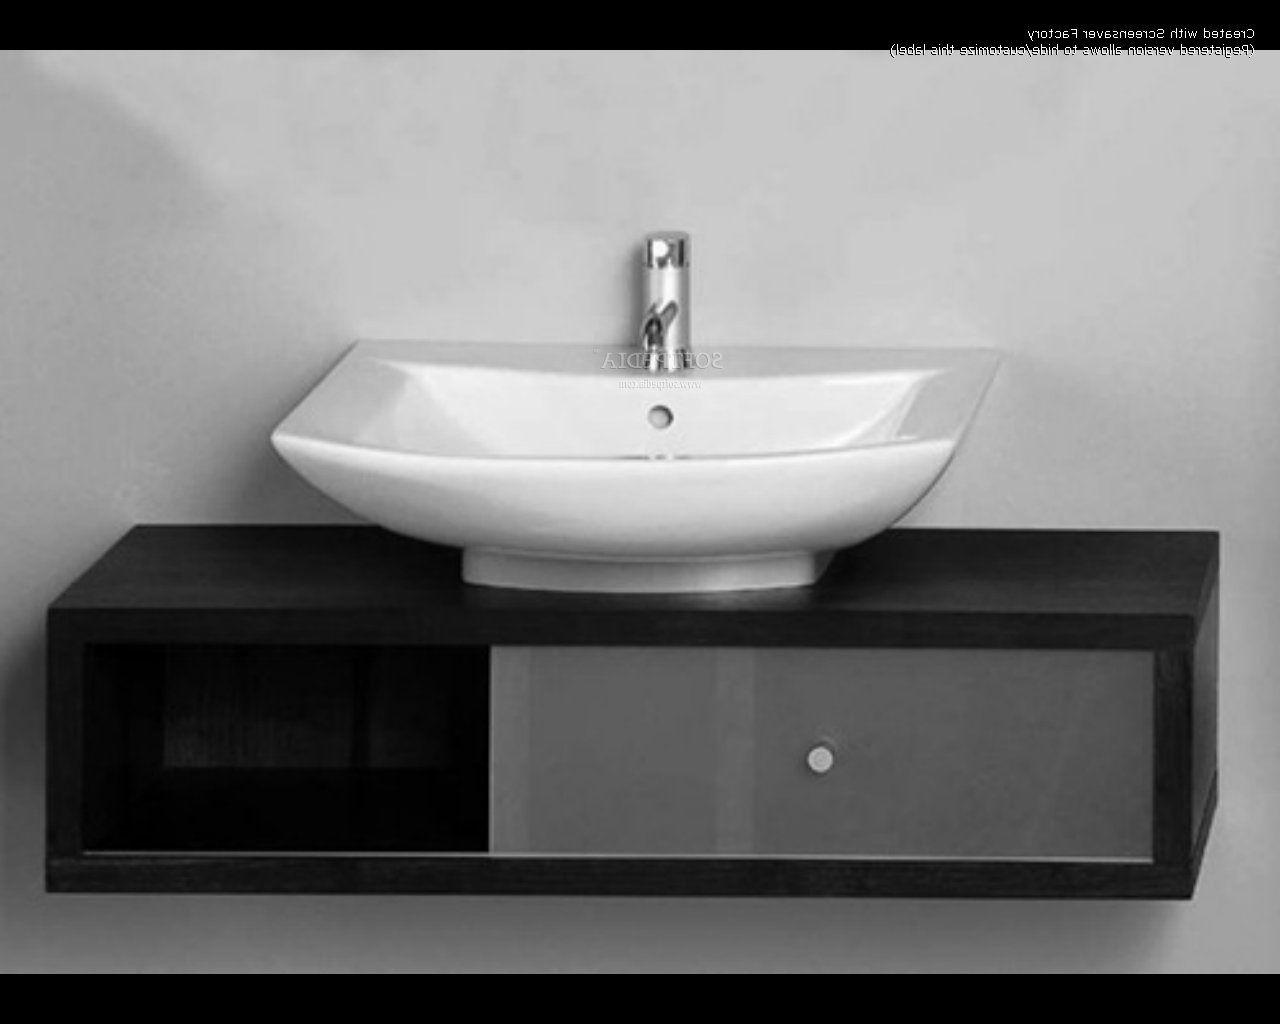 Cool Small Bathroom Sinks  Bathroom  Pinterest  Small Bathroom Stunning Bathroom Sinks Small Decorating Inspiration